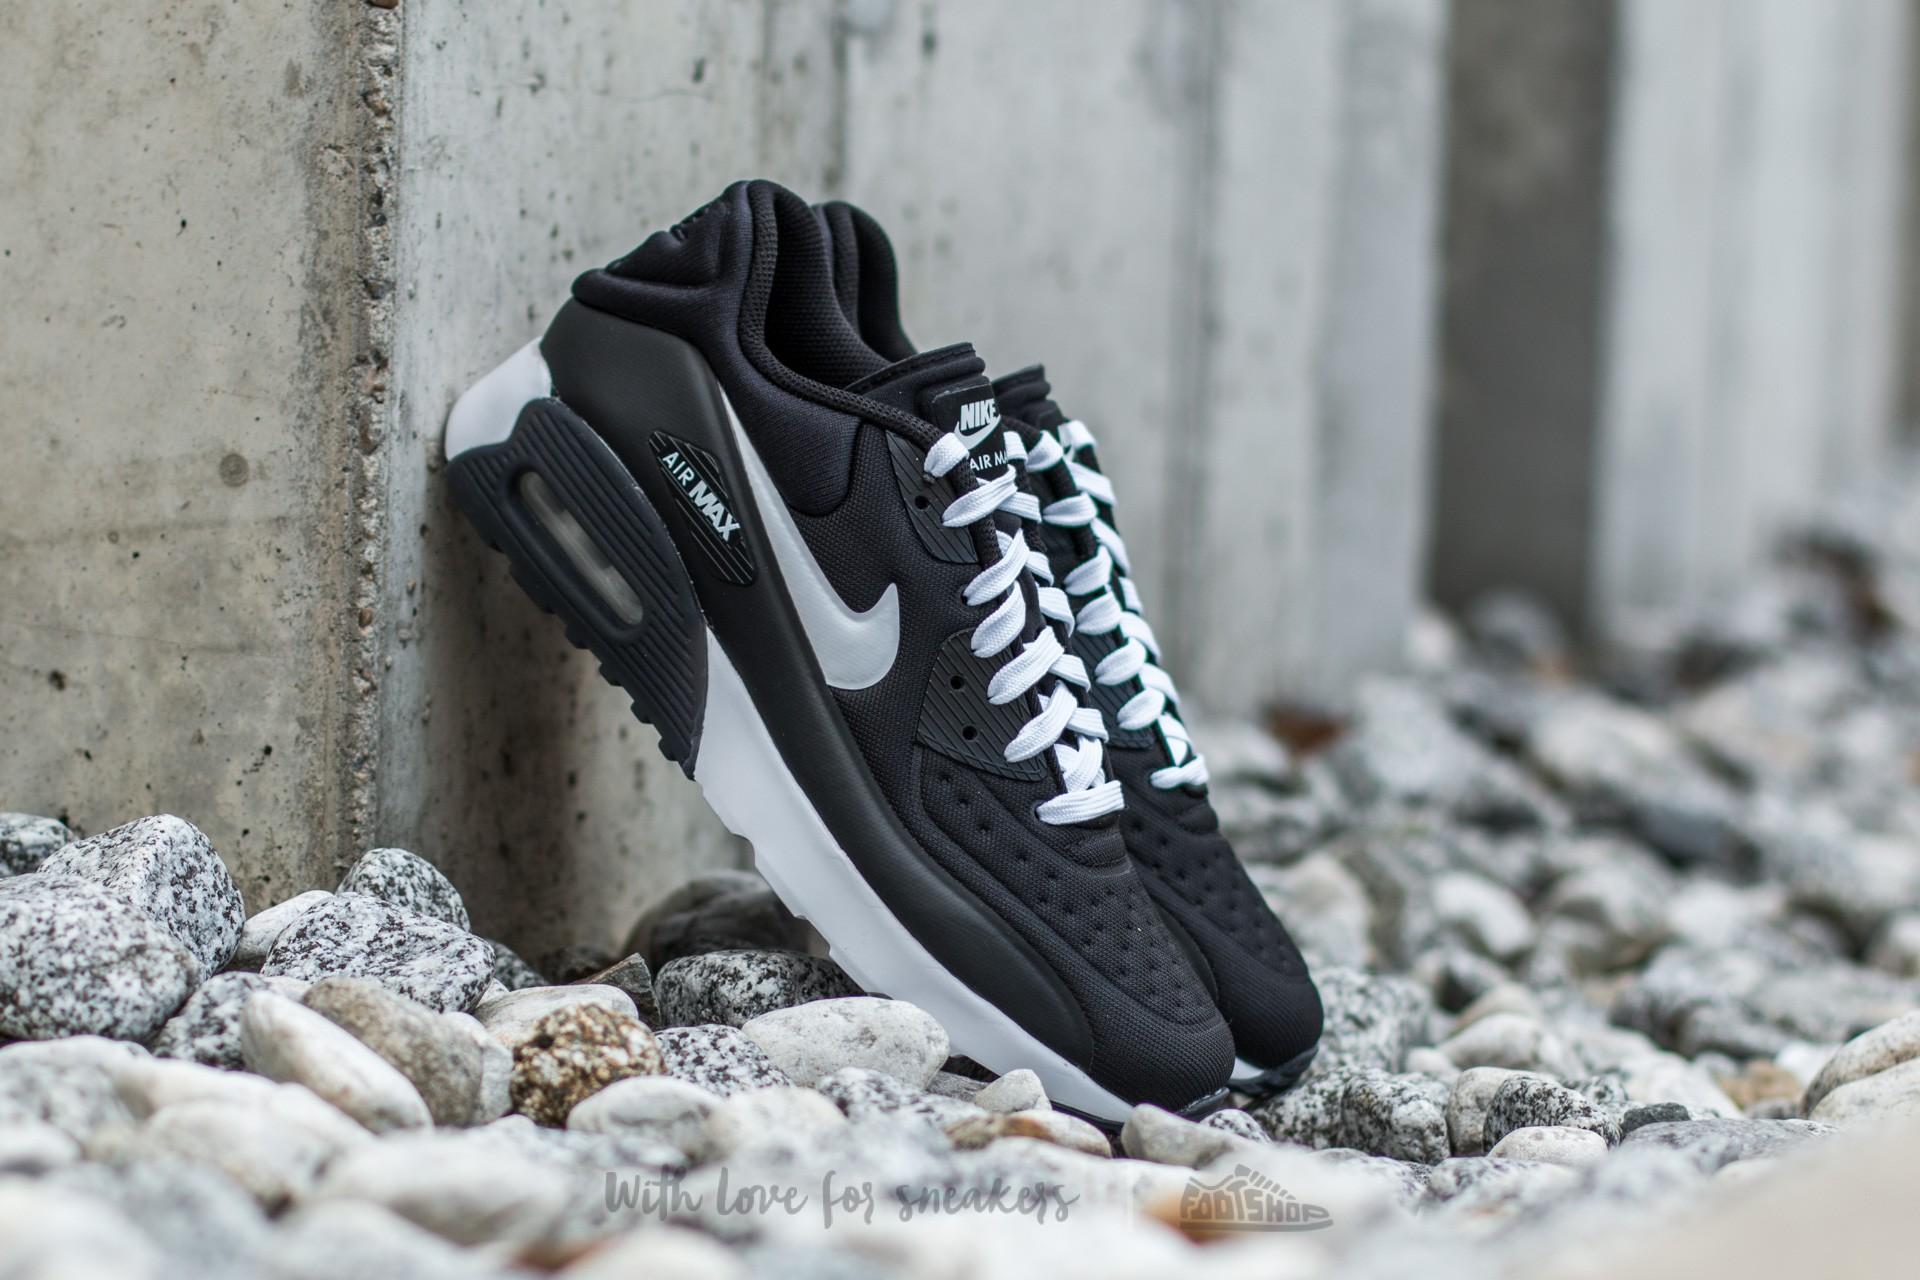 Nike Air Max 90 Ultra SE Black/ White-Anthracite-White Footshop – FR